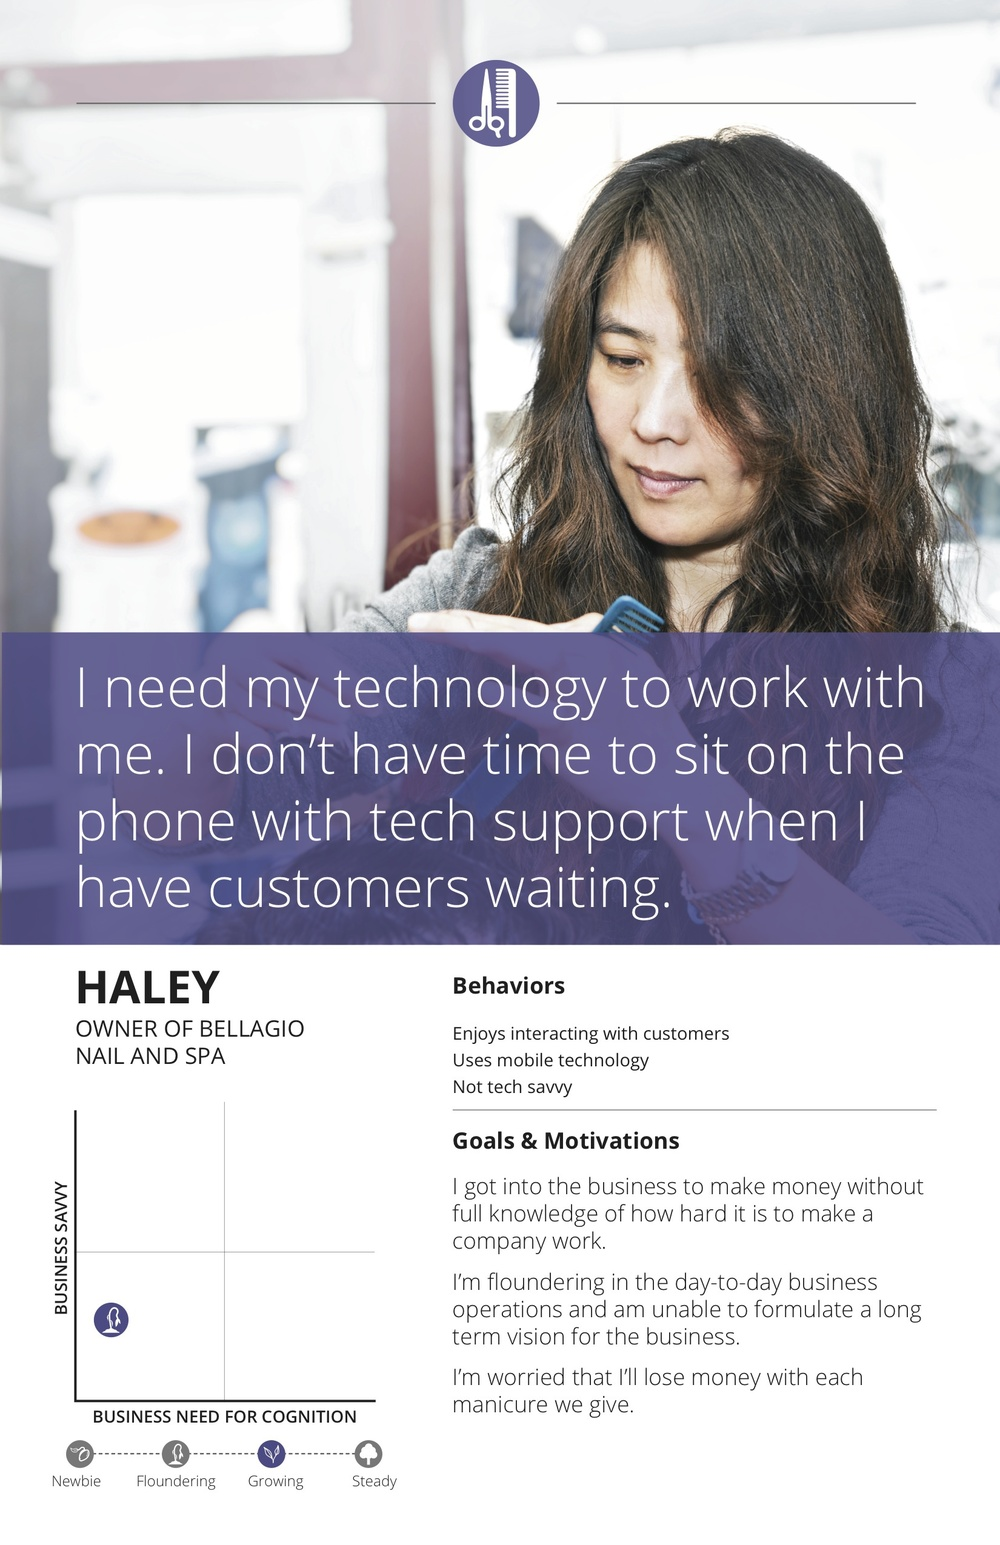 Merchant personas socialilzation poster_Haley.jpg